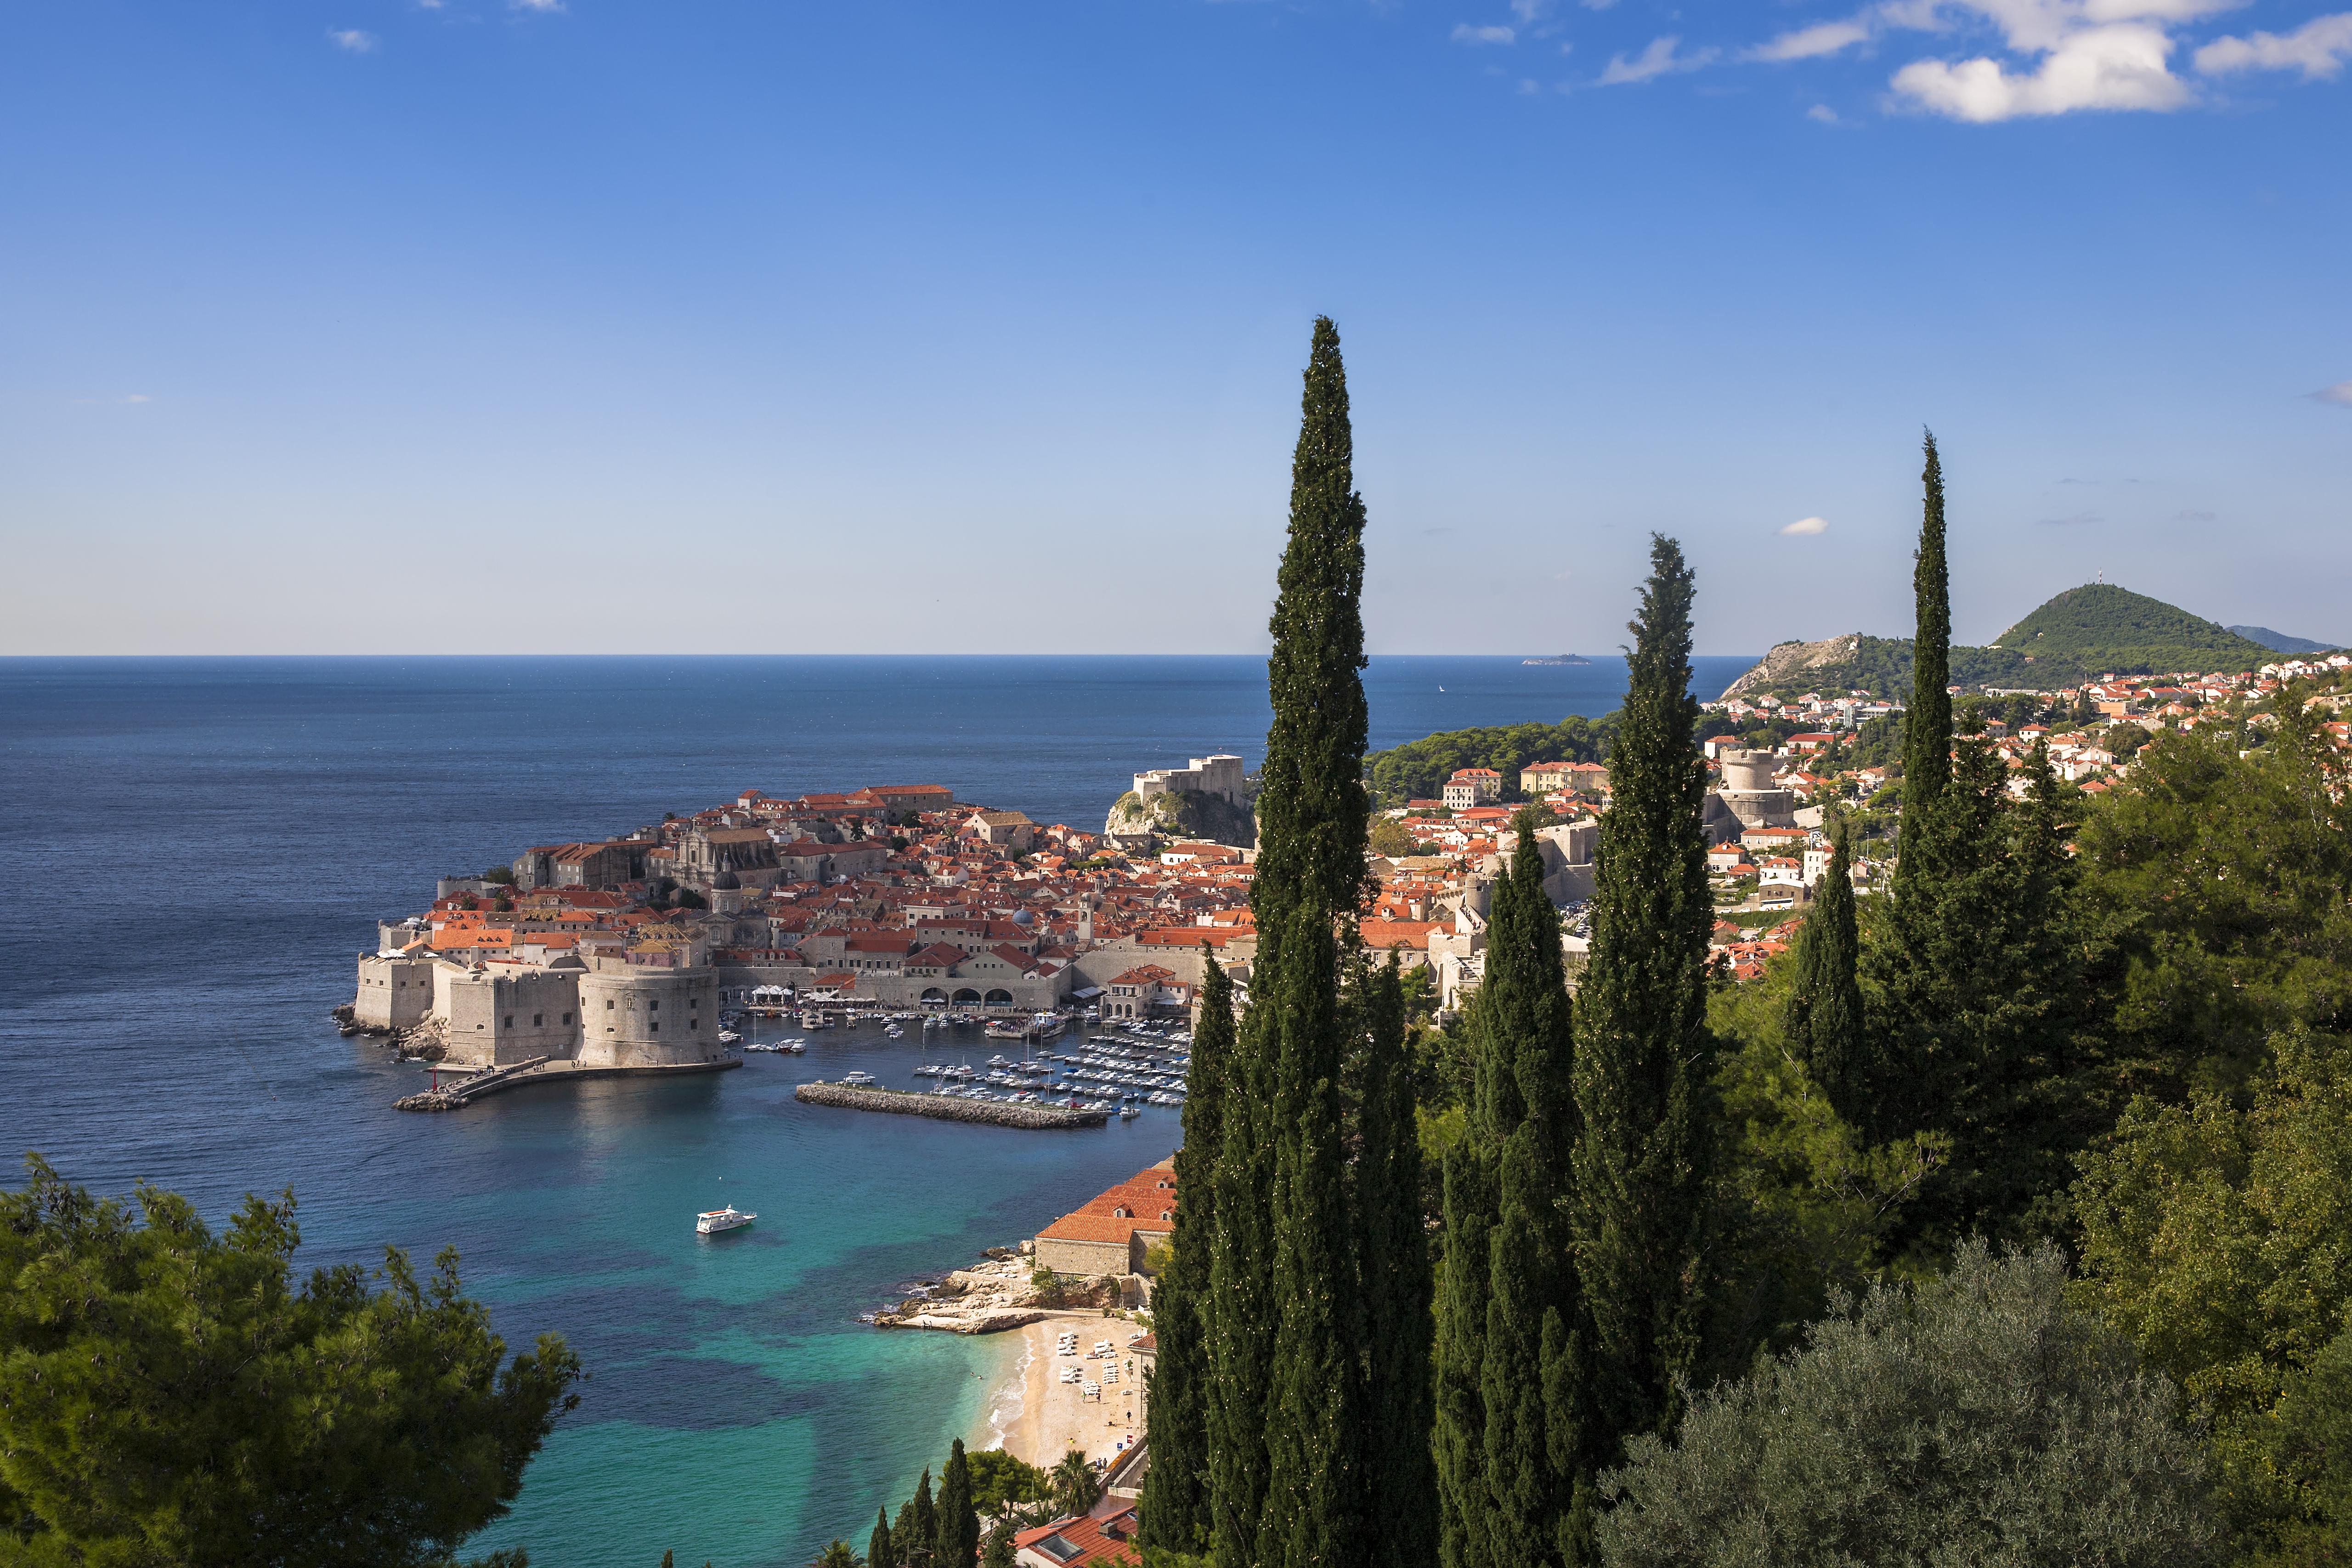 CR1 Dubrovnik: Stari Grad